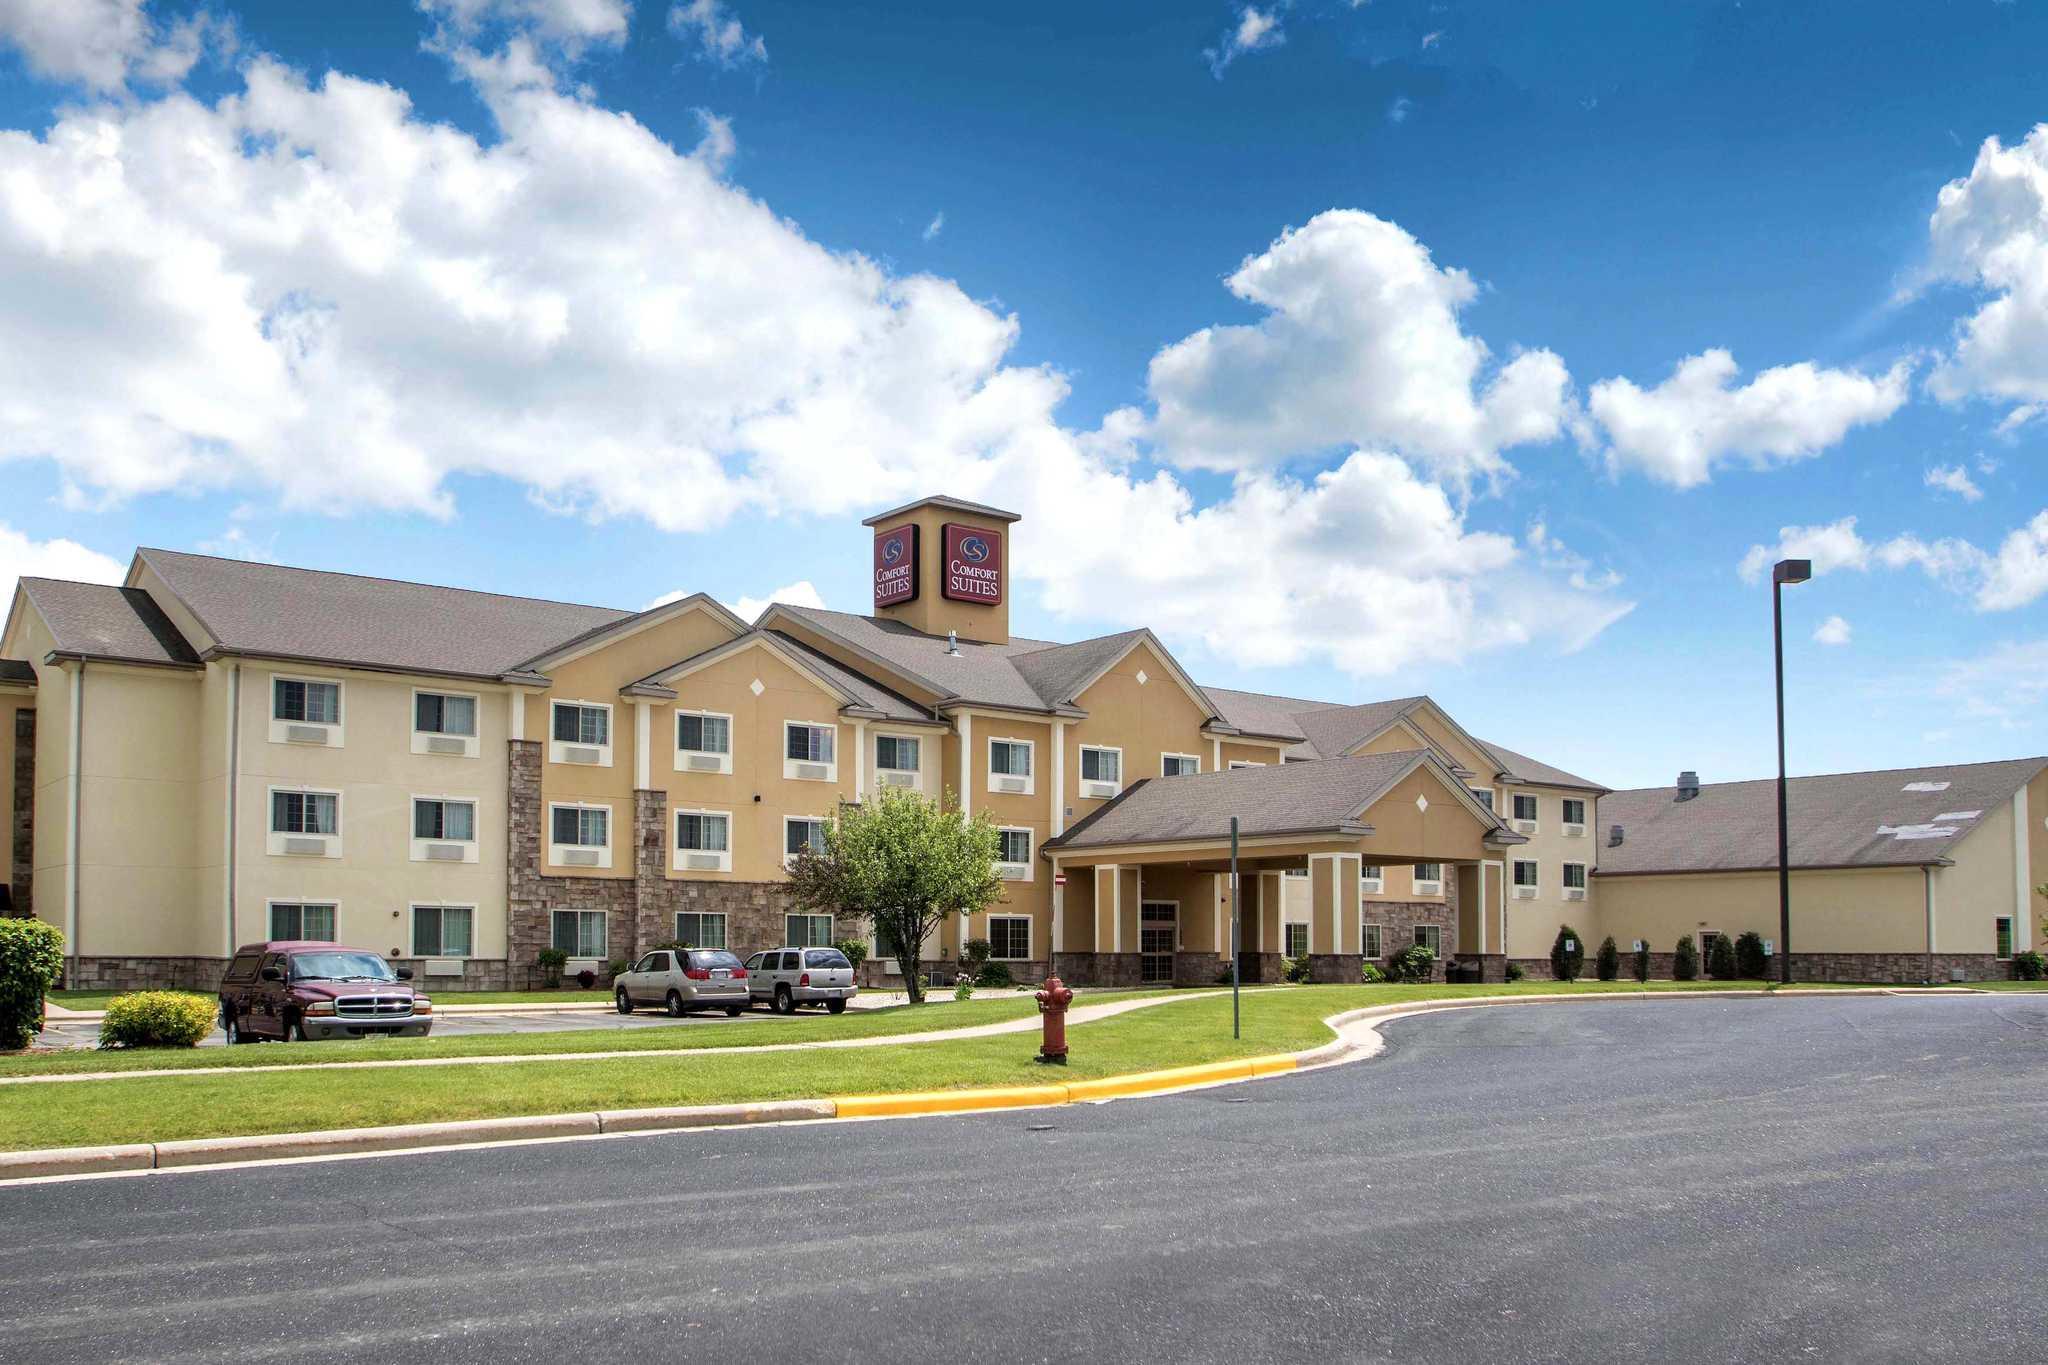 Comfort Suites Johnson Creek Conference Center image 1